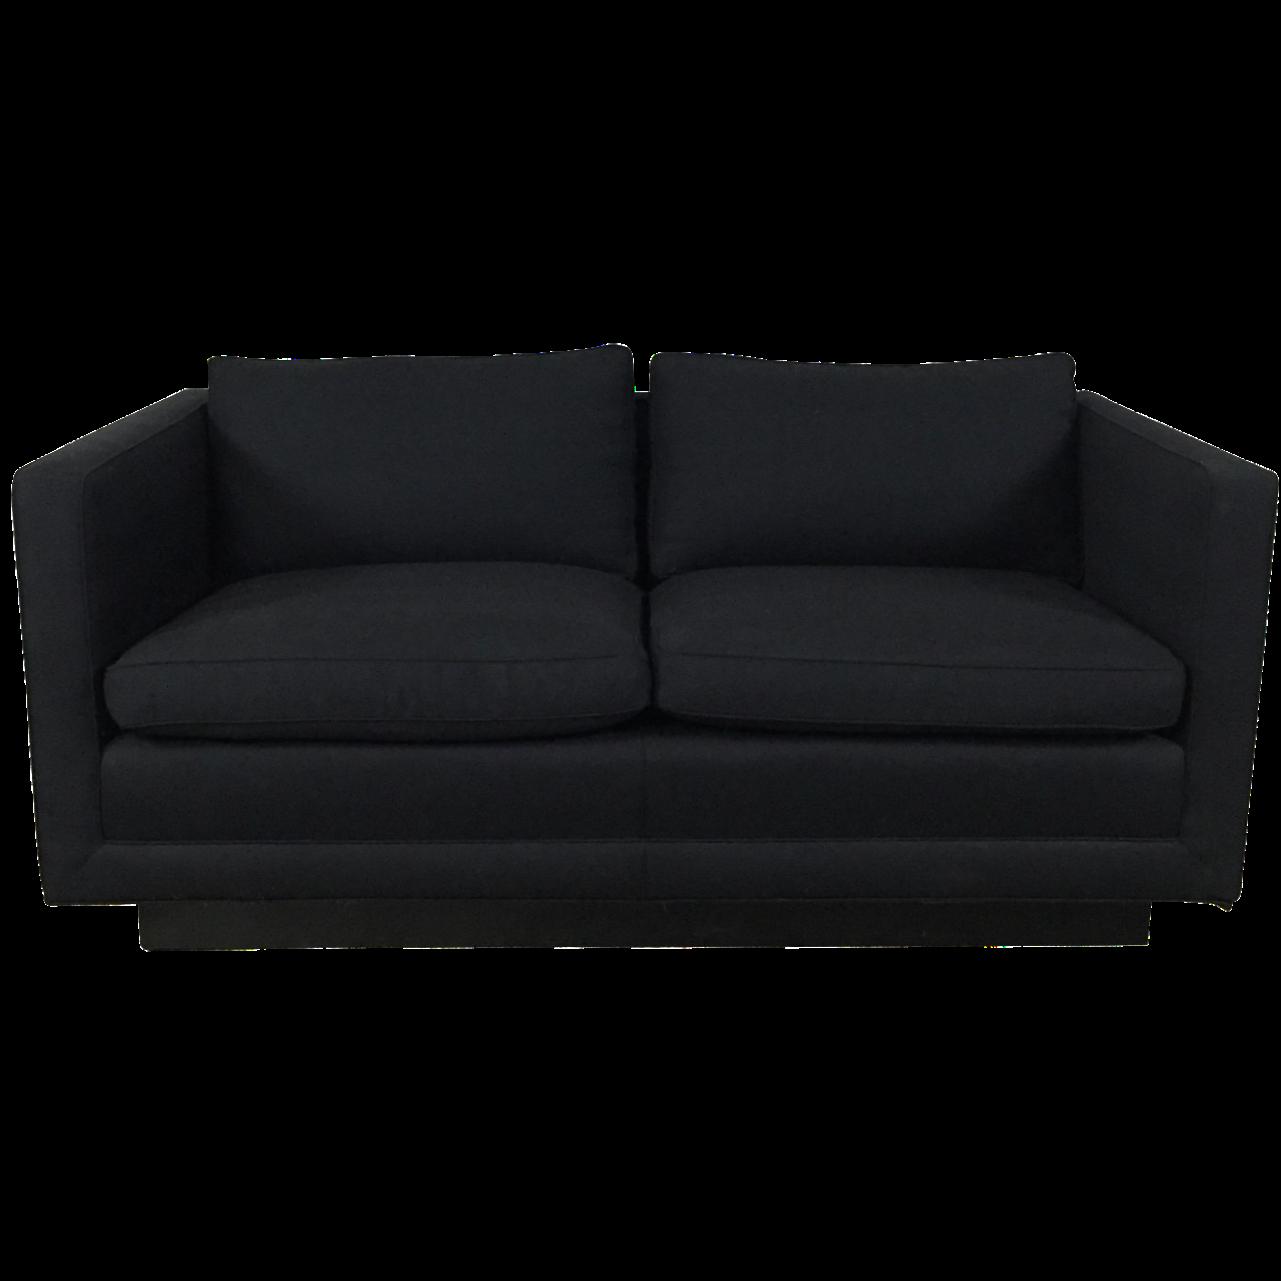 Knoll Pfister Standard Settee Sofa Chairish